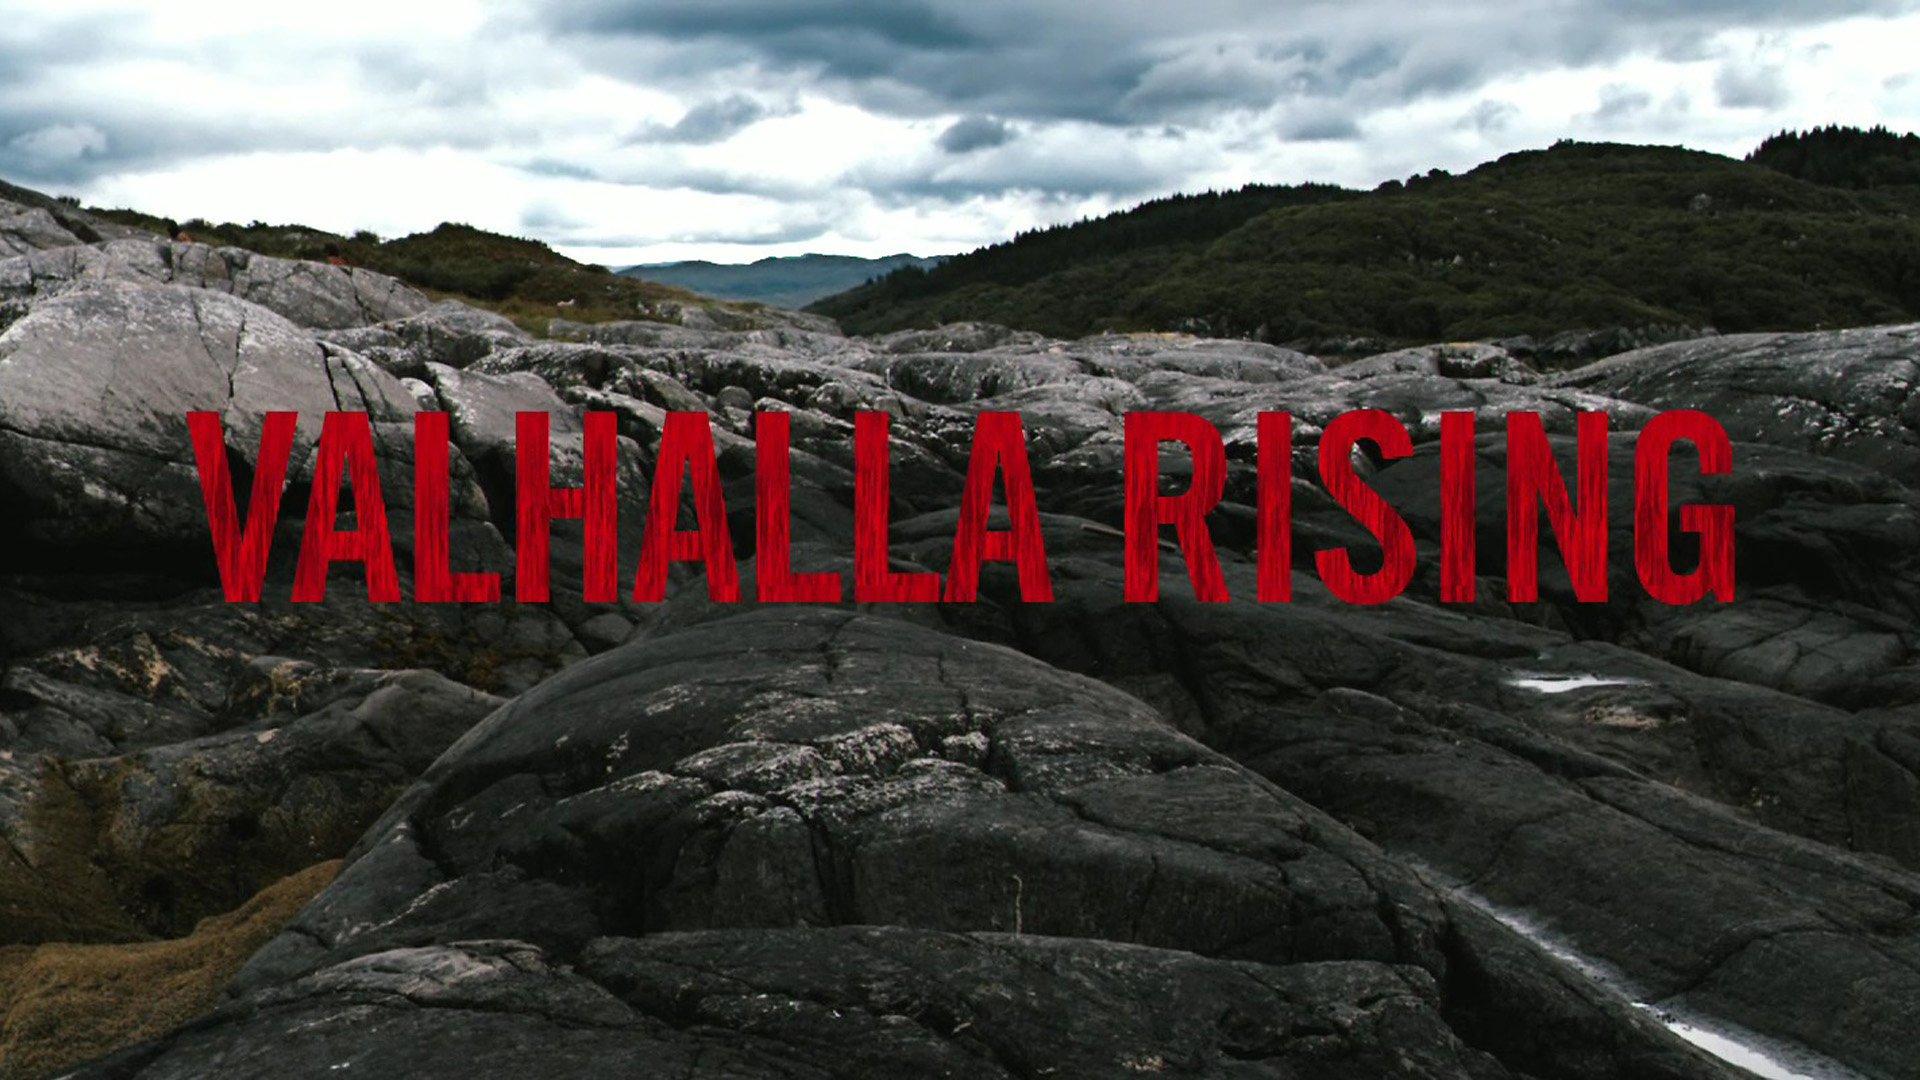 Valhalla Rising Fondo De Pantalla Hd Fondo De Escritorio